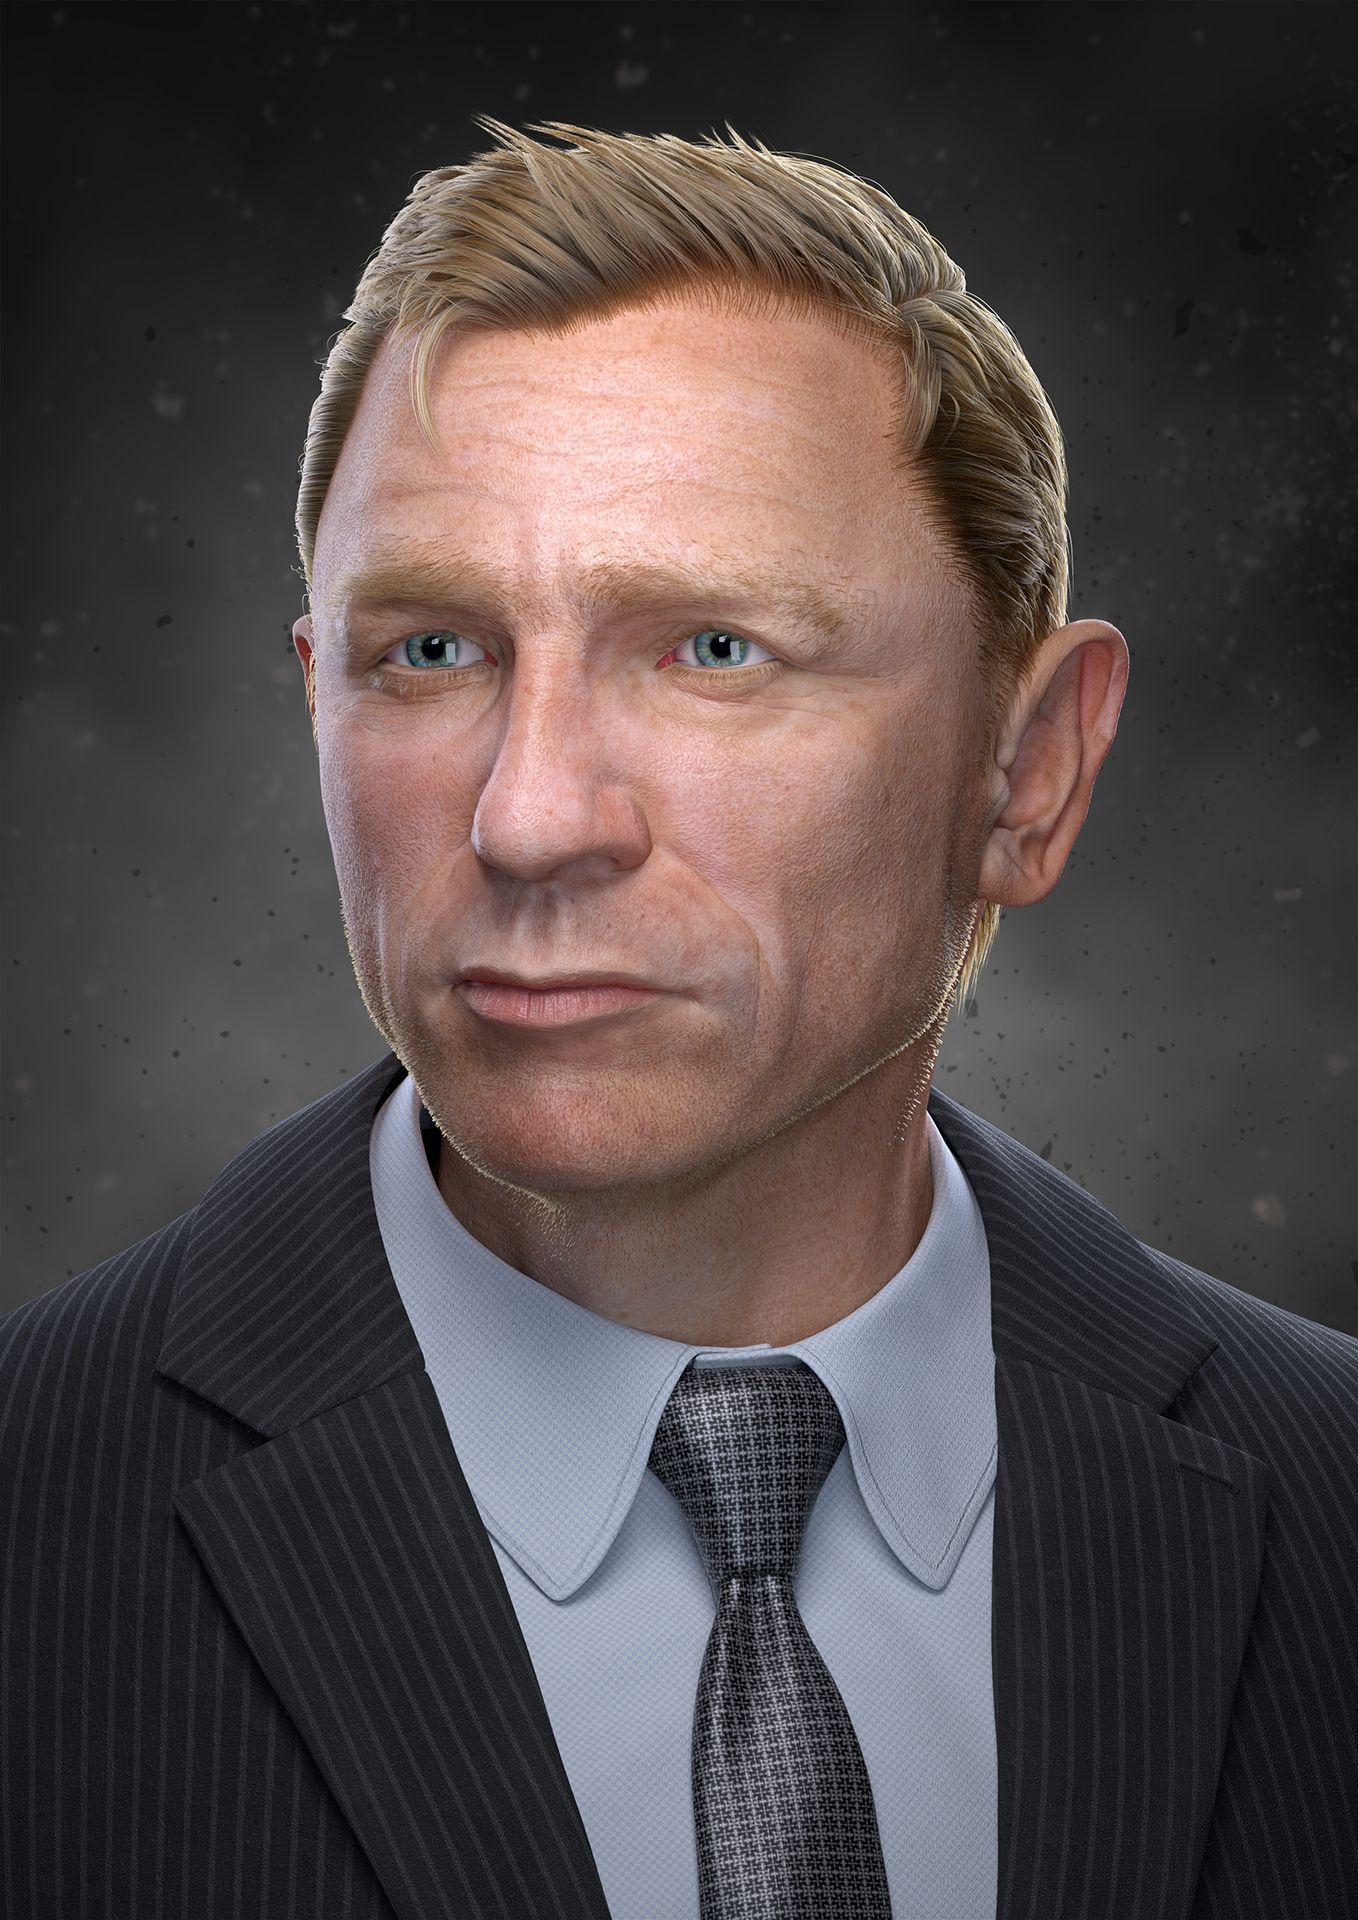 Daniel%20 Craig%20 Portrait%202 Thomasongo